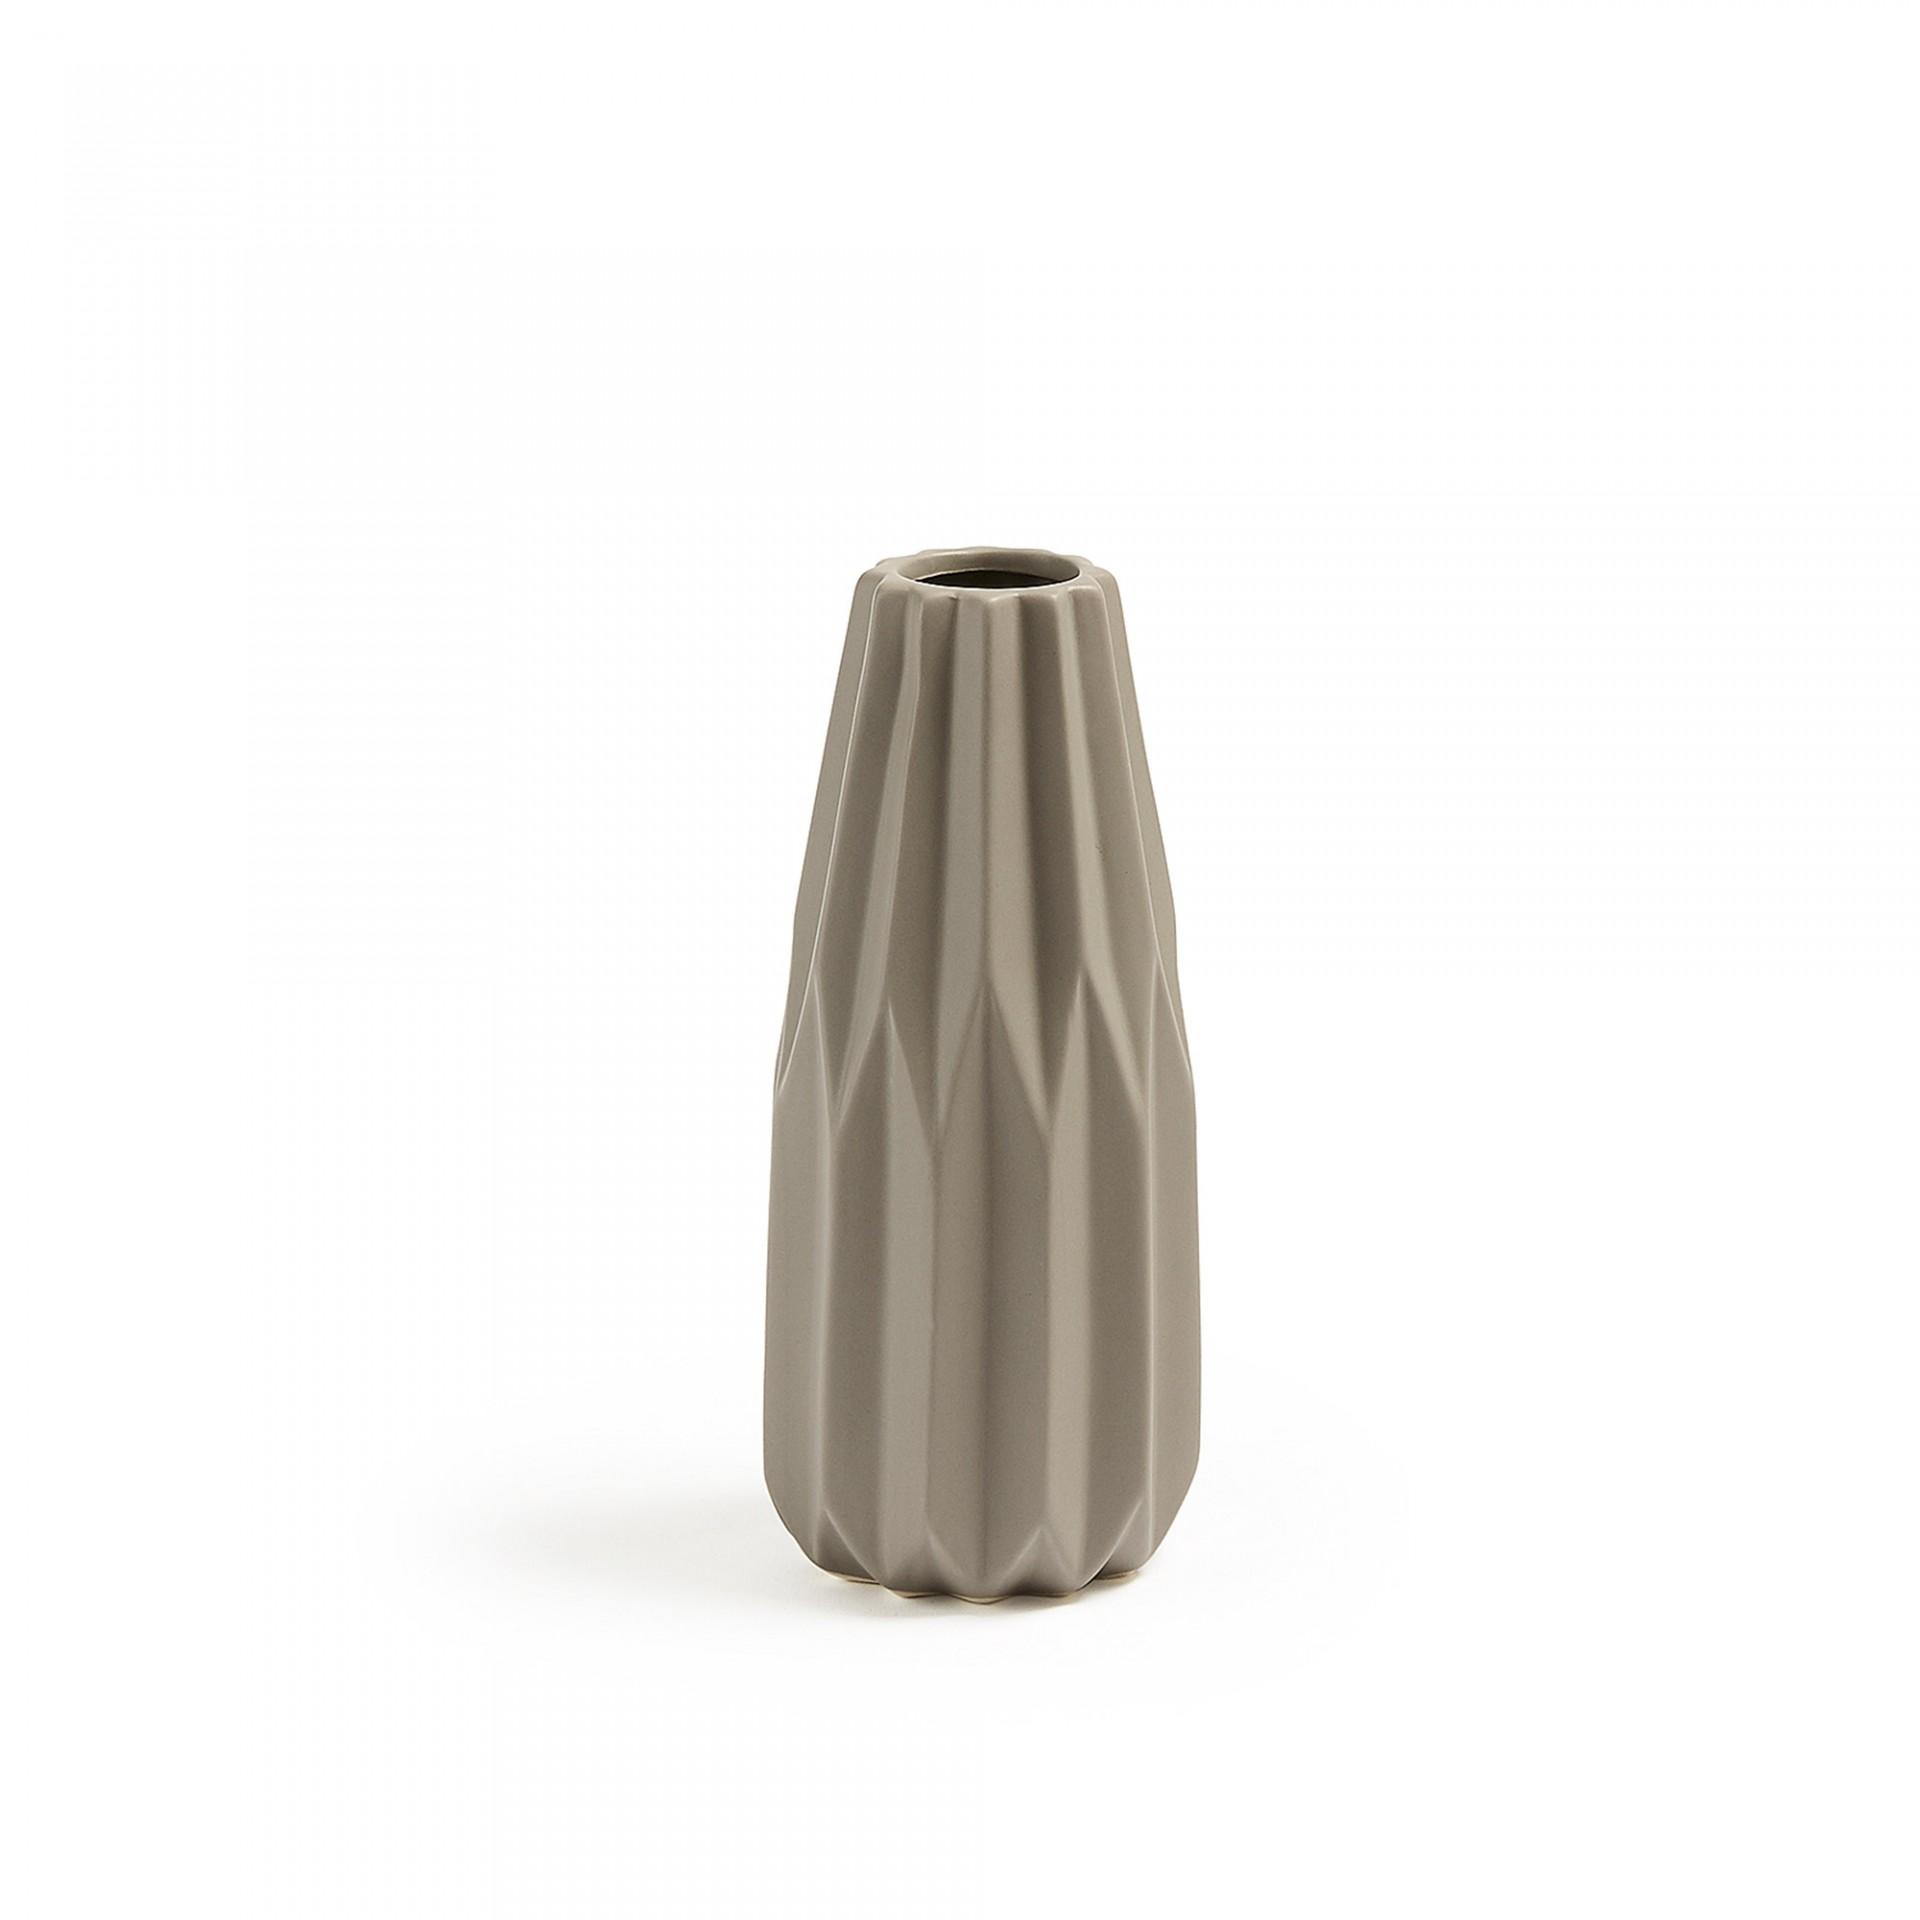 Jarra em cerâmica, Ø11x26 cm